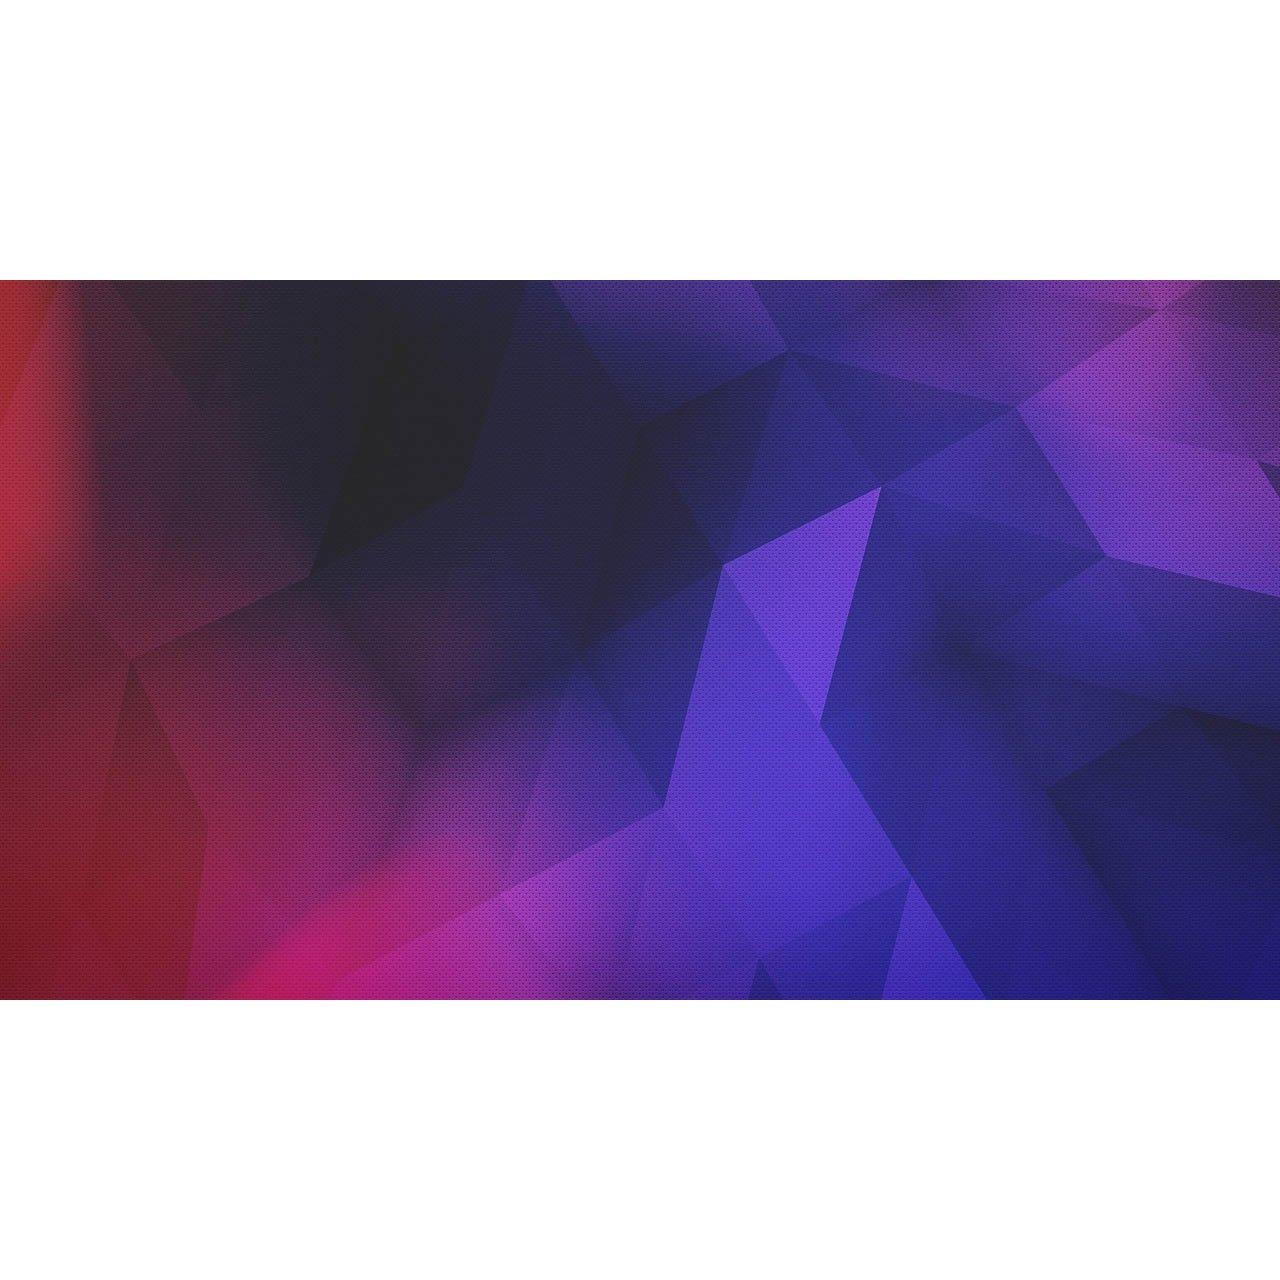 mouse pad colors 50818 2000 202596 3